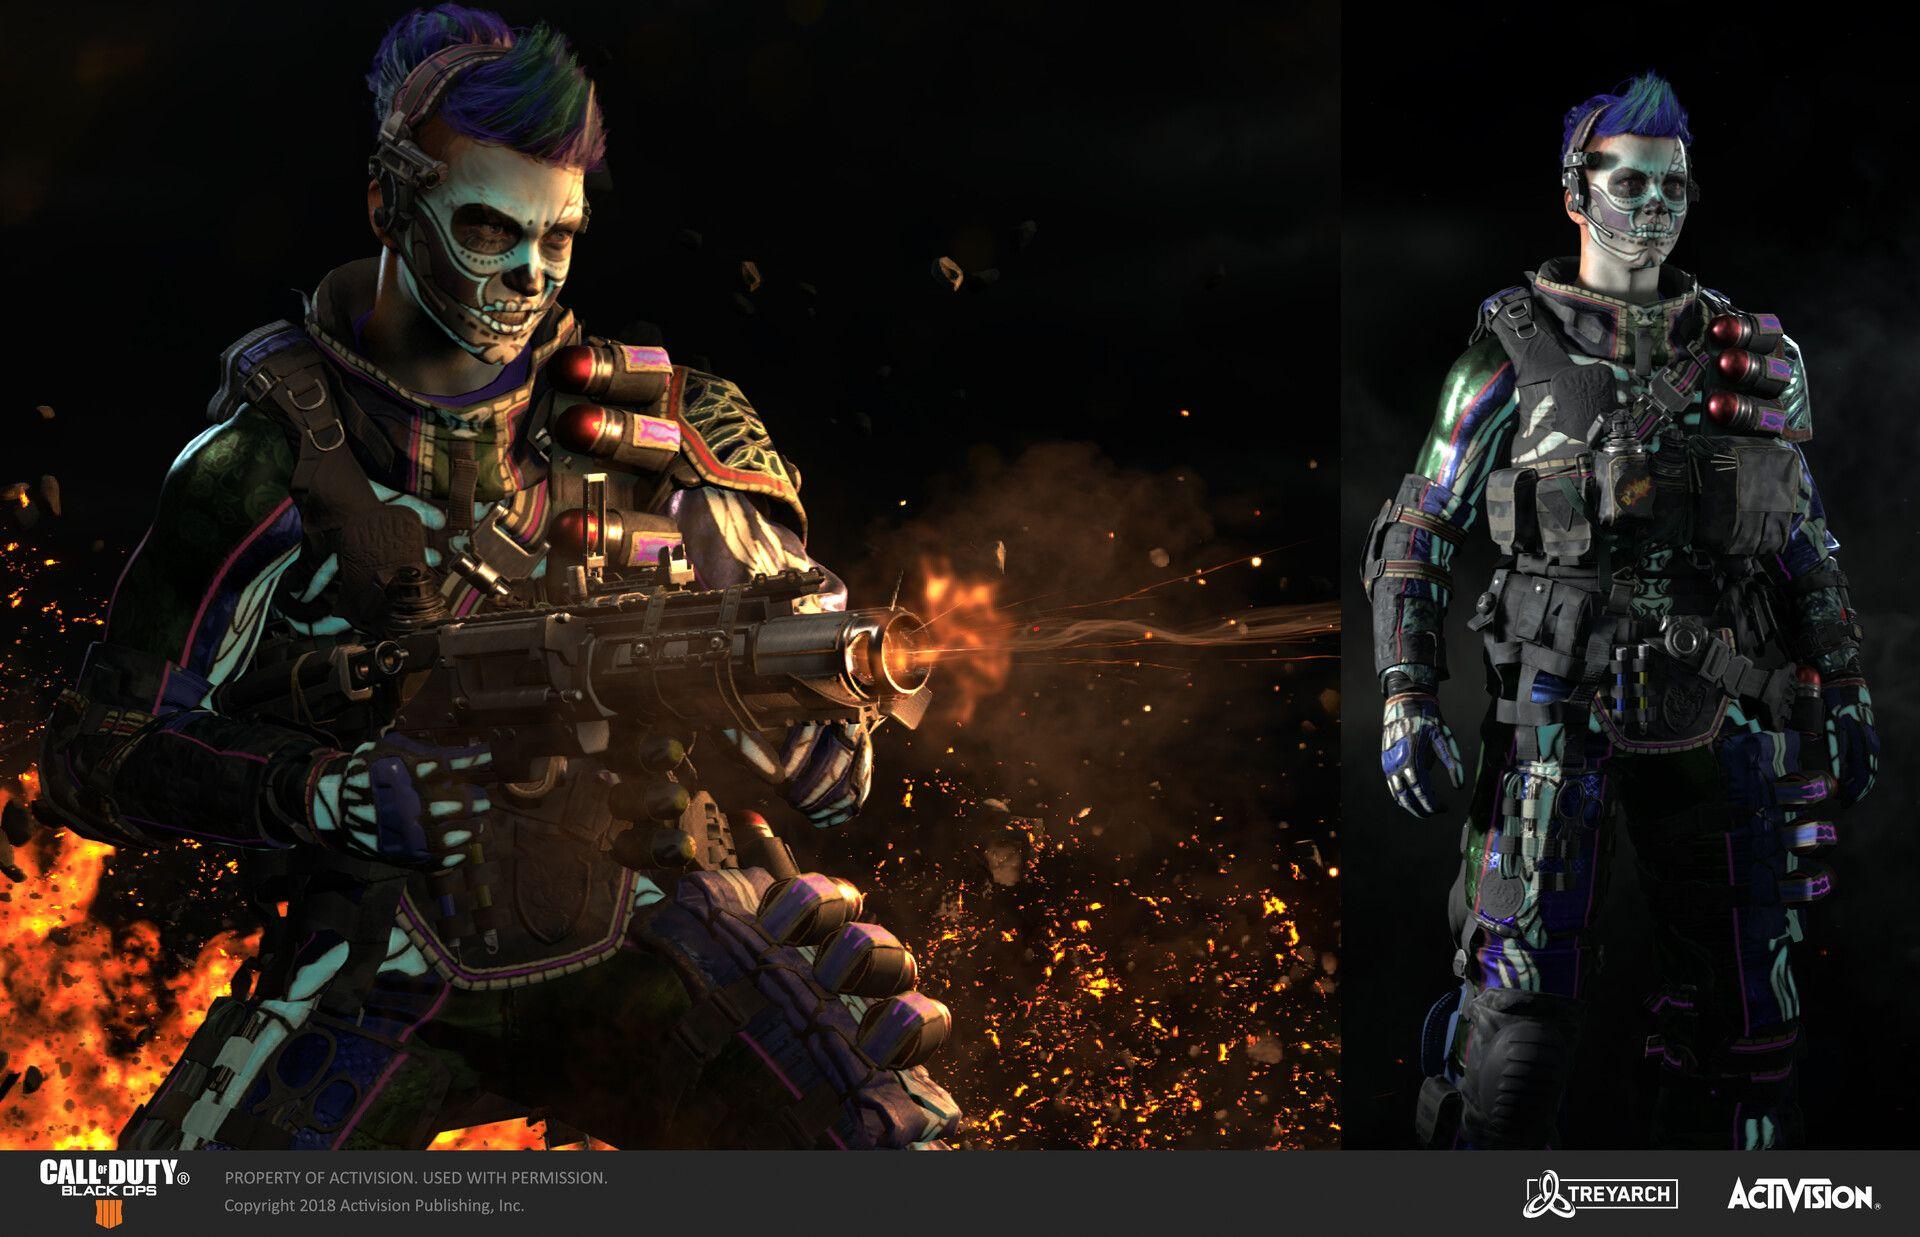 Battery Muertos Skins Call Of Duty Black Ops 4 By Peter Zoppi Https Www Artstation Com Artwork Za4eqz Textured With Black Ops 4 Call Of Duty Black Ops